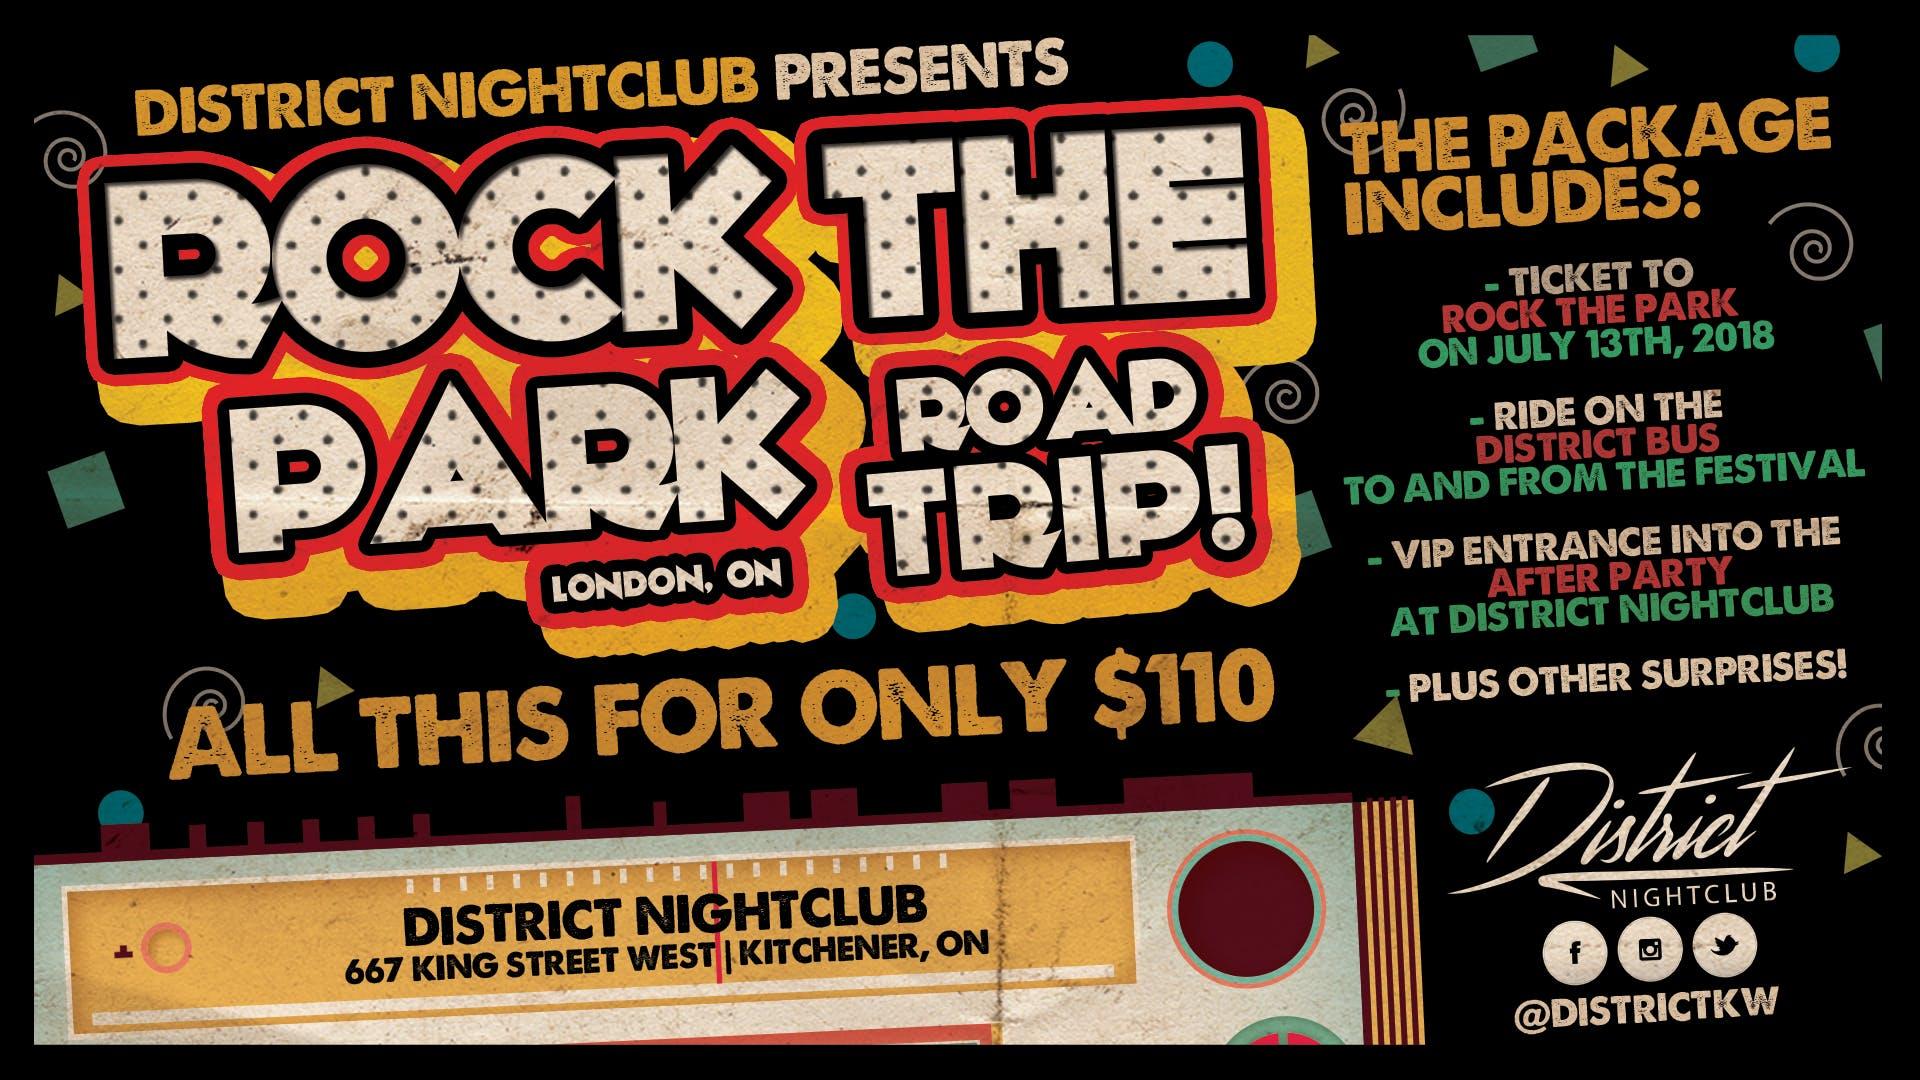 District Nightclub Rock The Park Road Trip